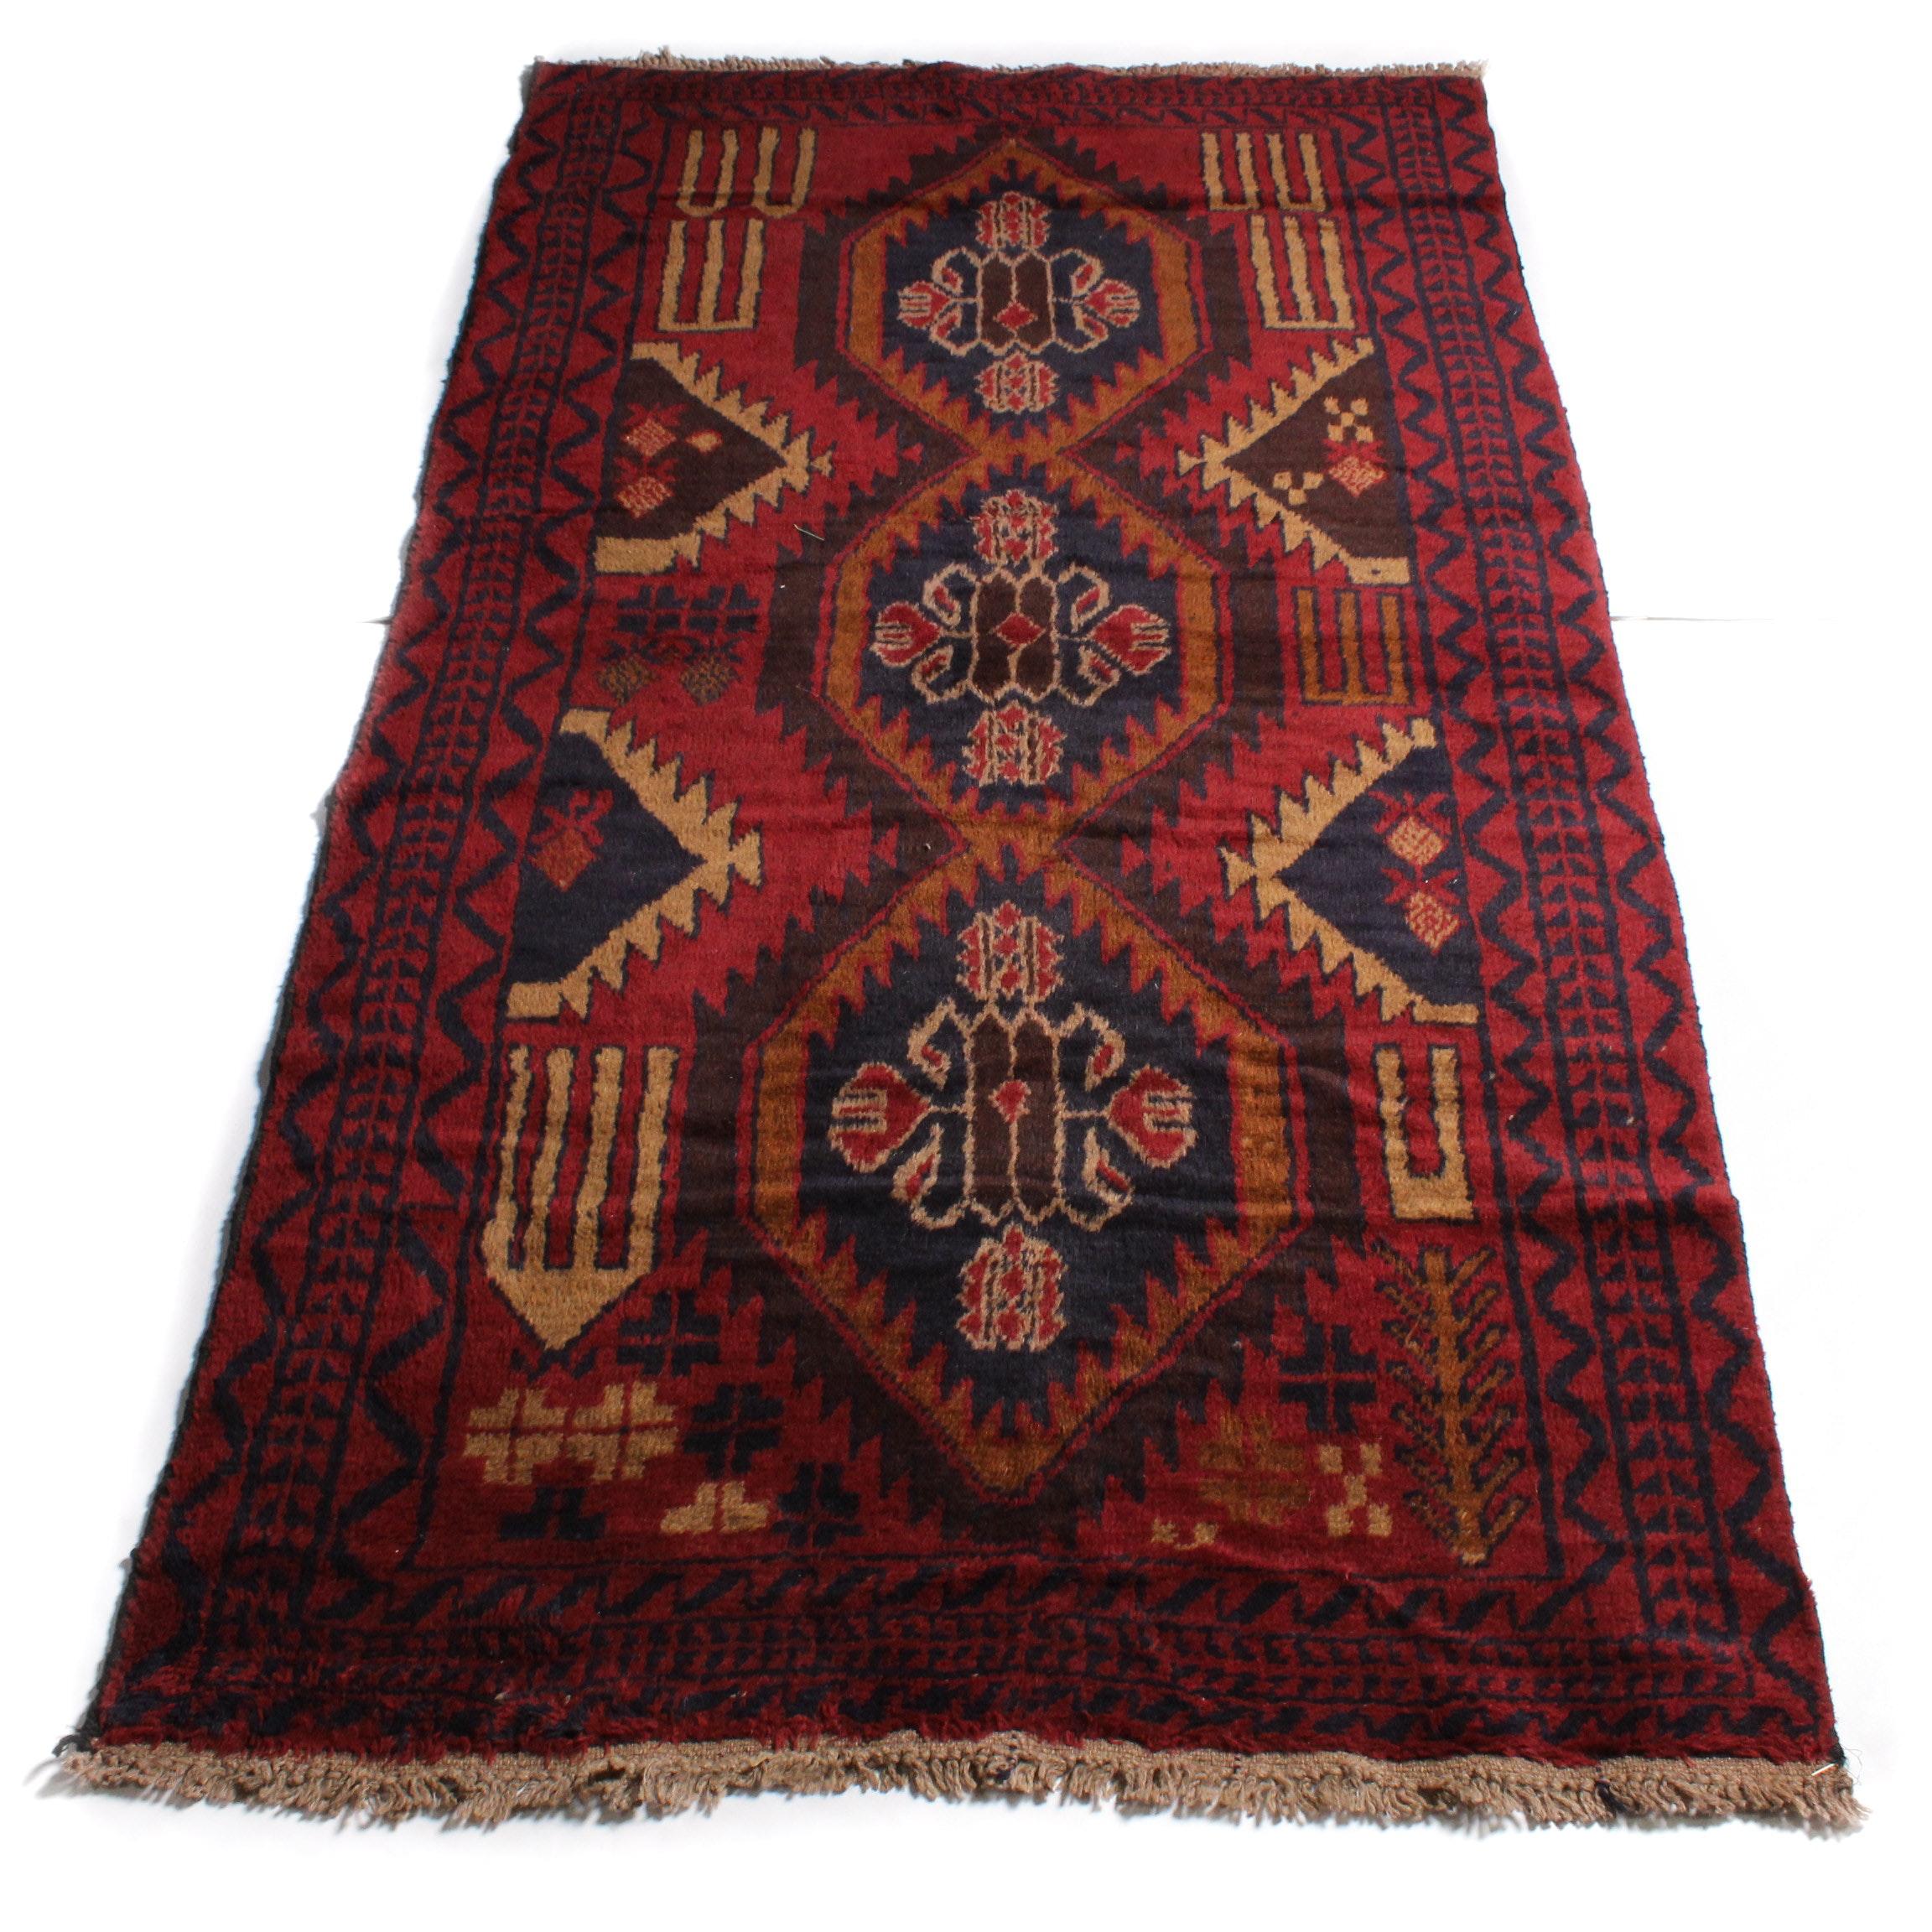 3'6 x 6'8 Hand-Knotted Afghan Kazak Rug